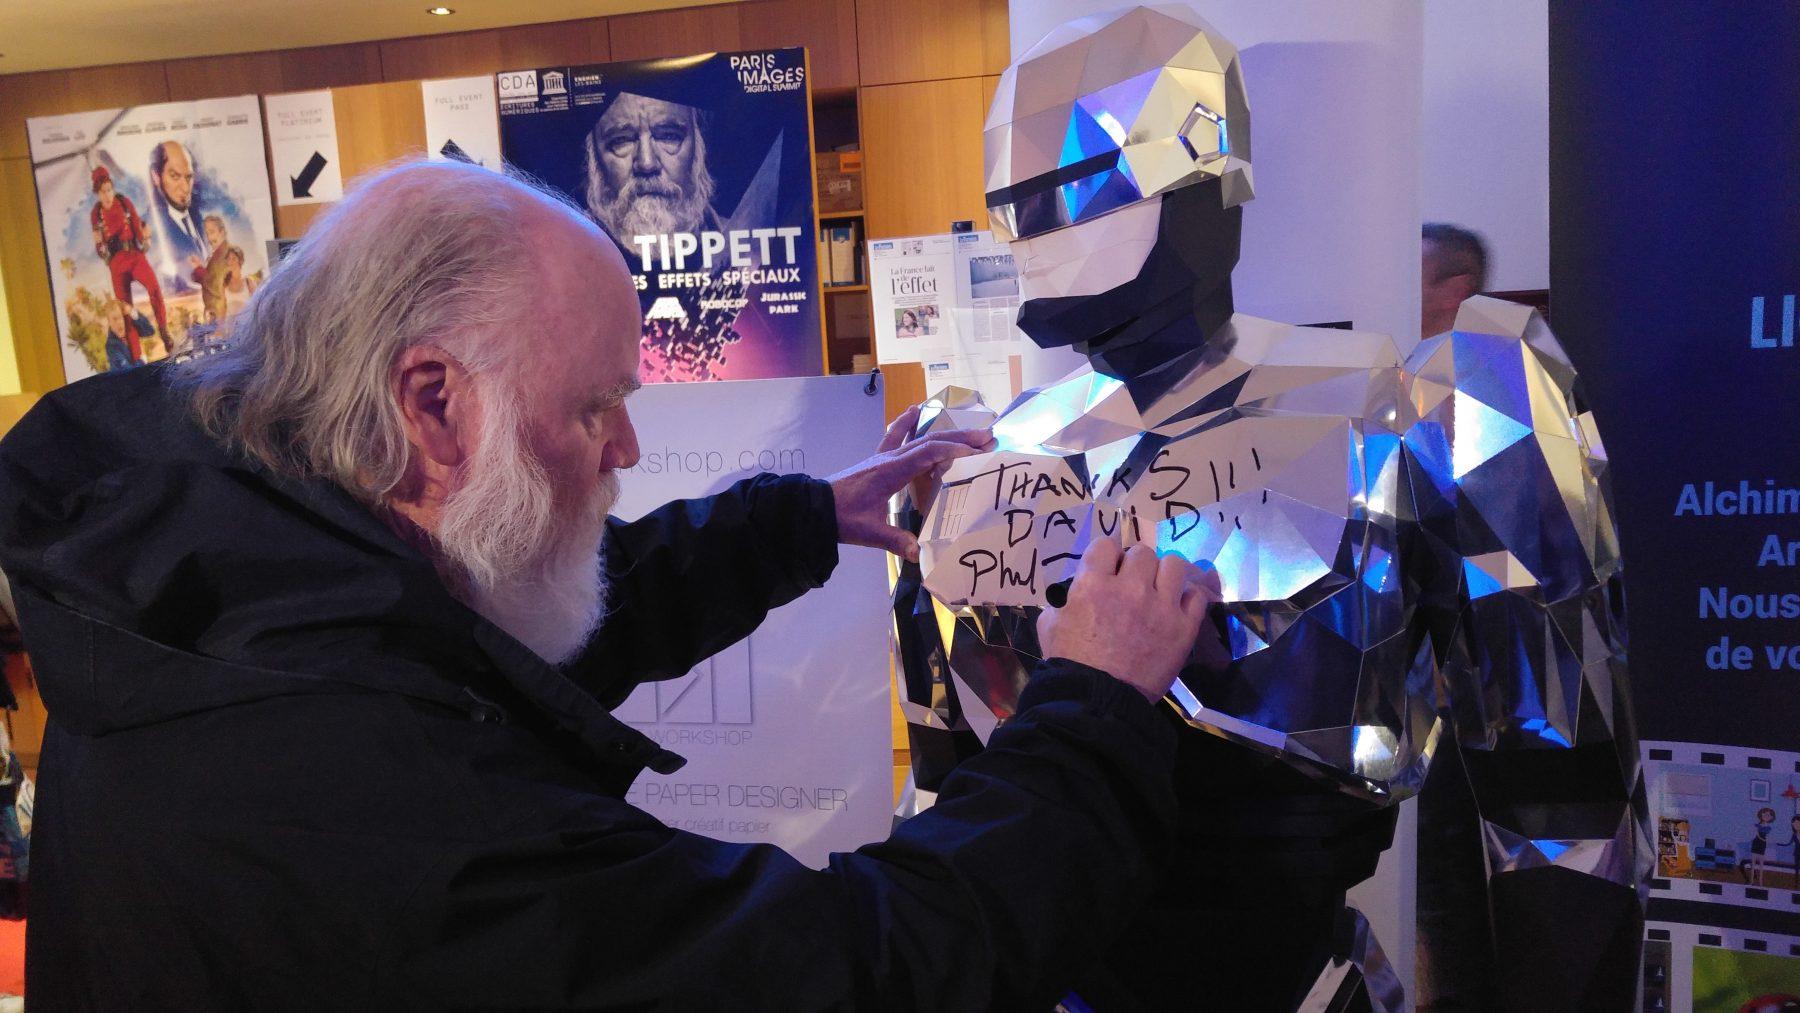 Phil Tippett Robocop Paper Papier Origami Low Poly